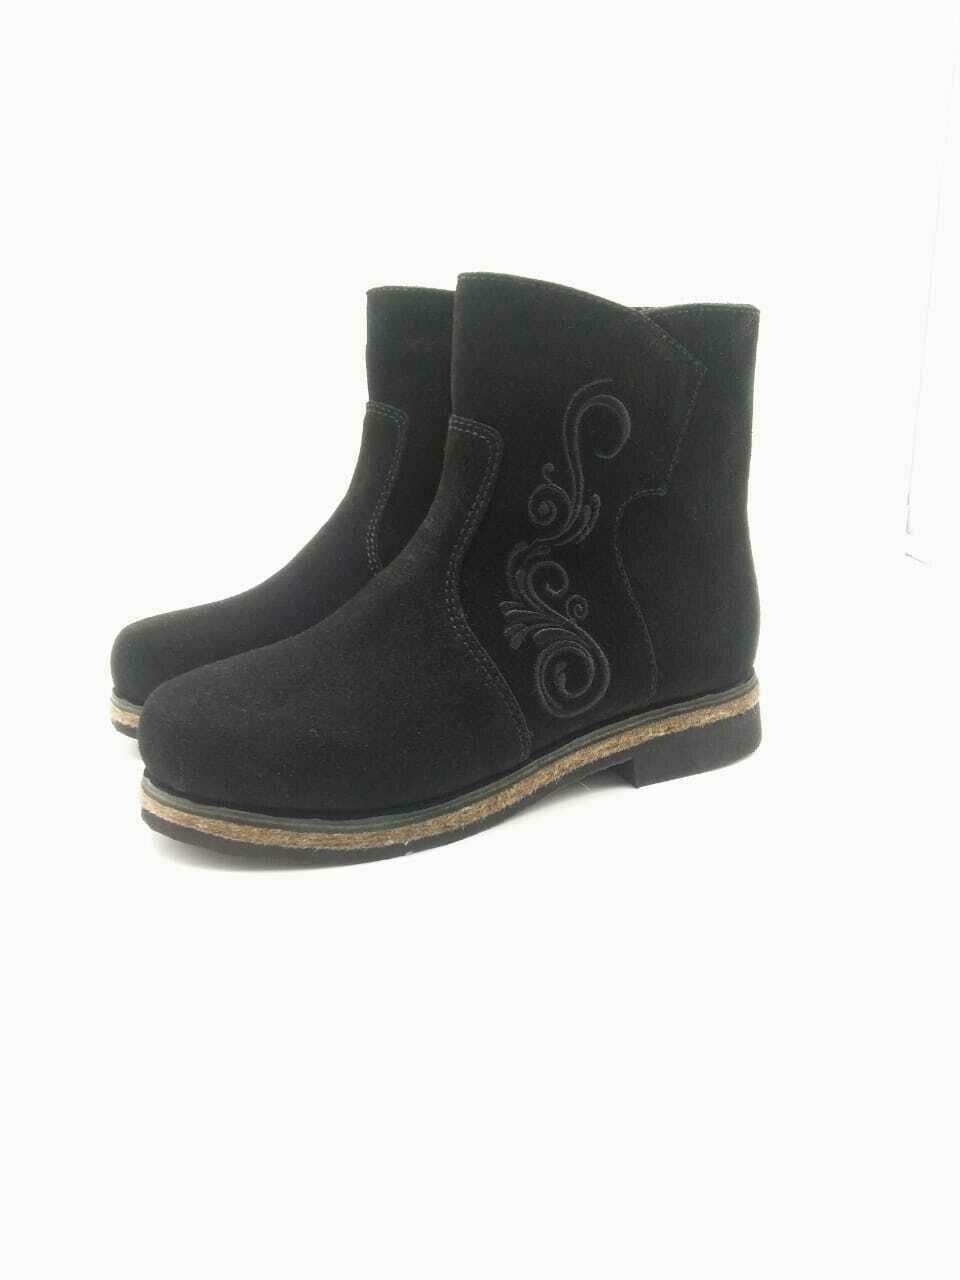 40 Унты-ботиночки из замши на молнии